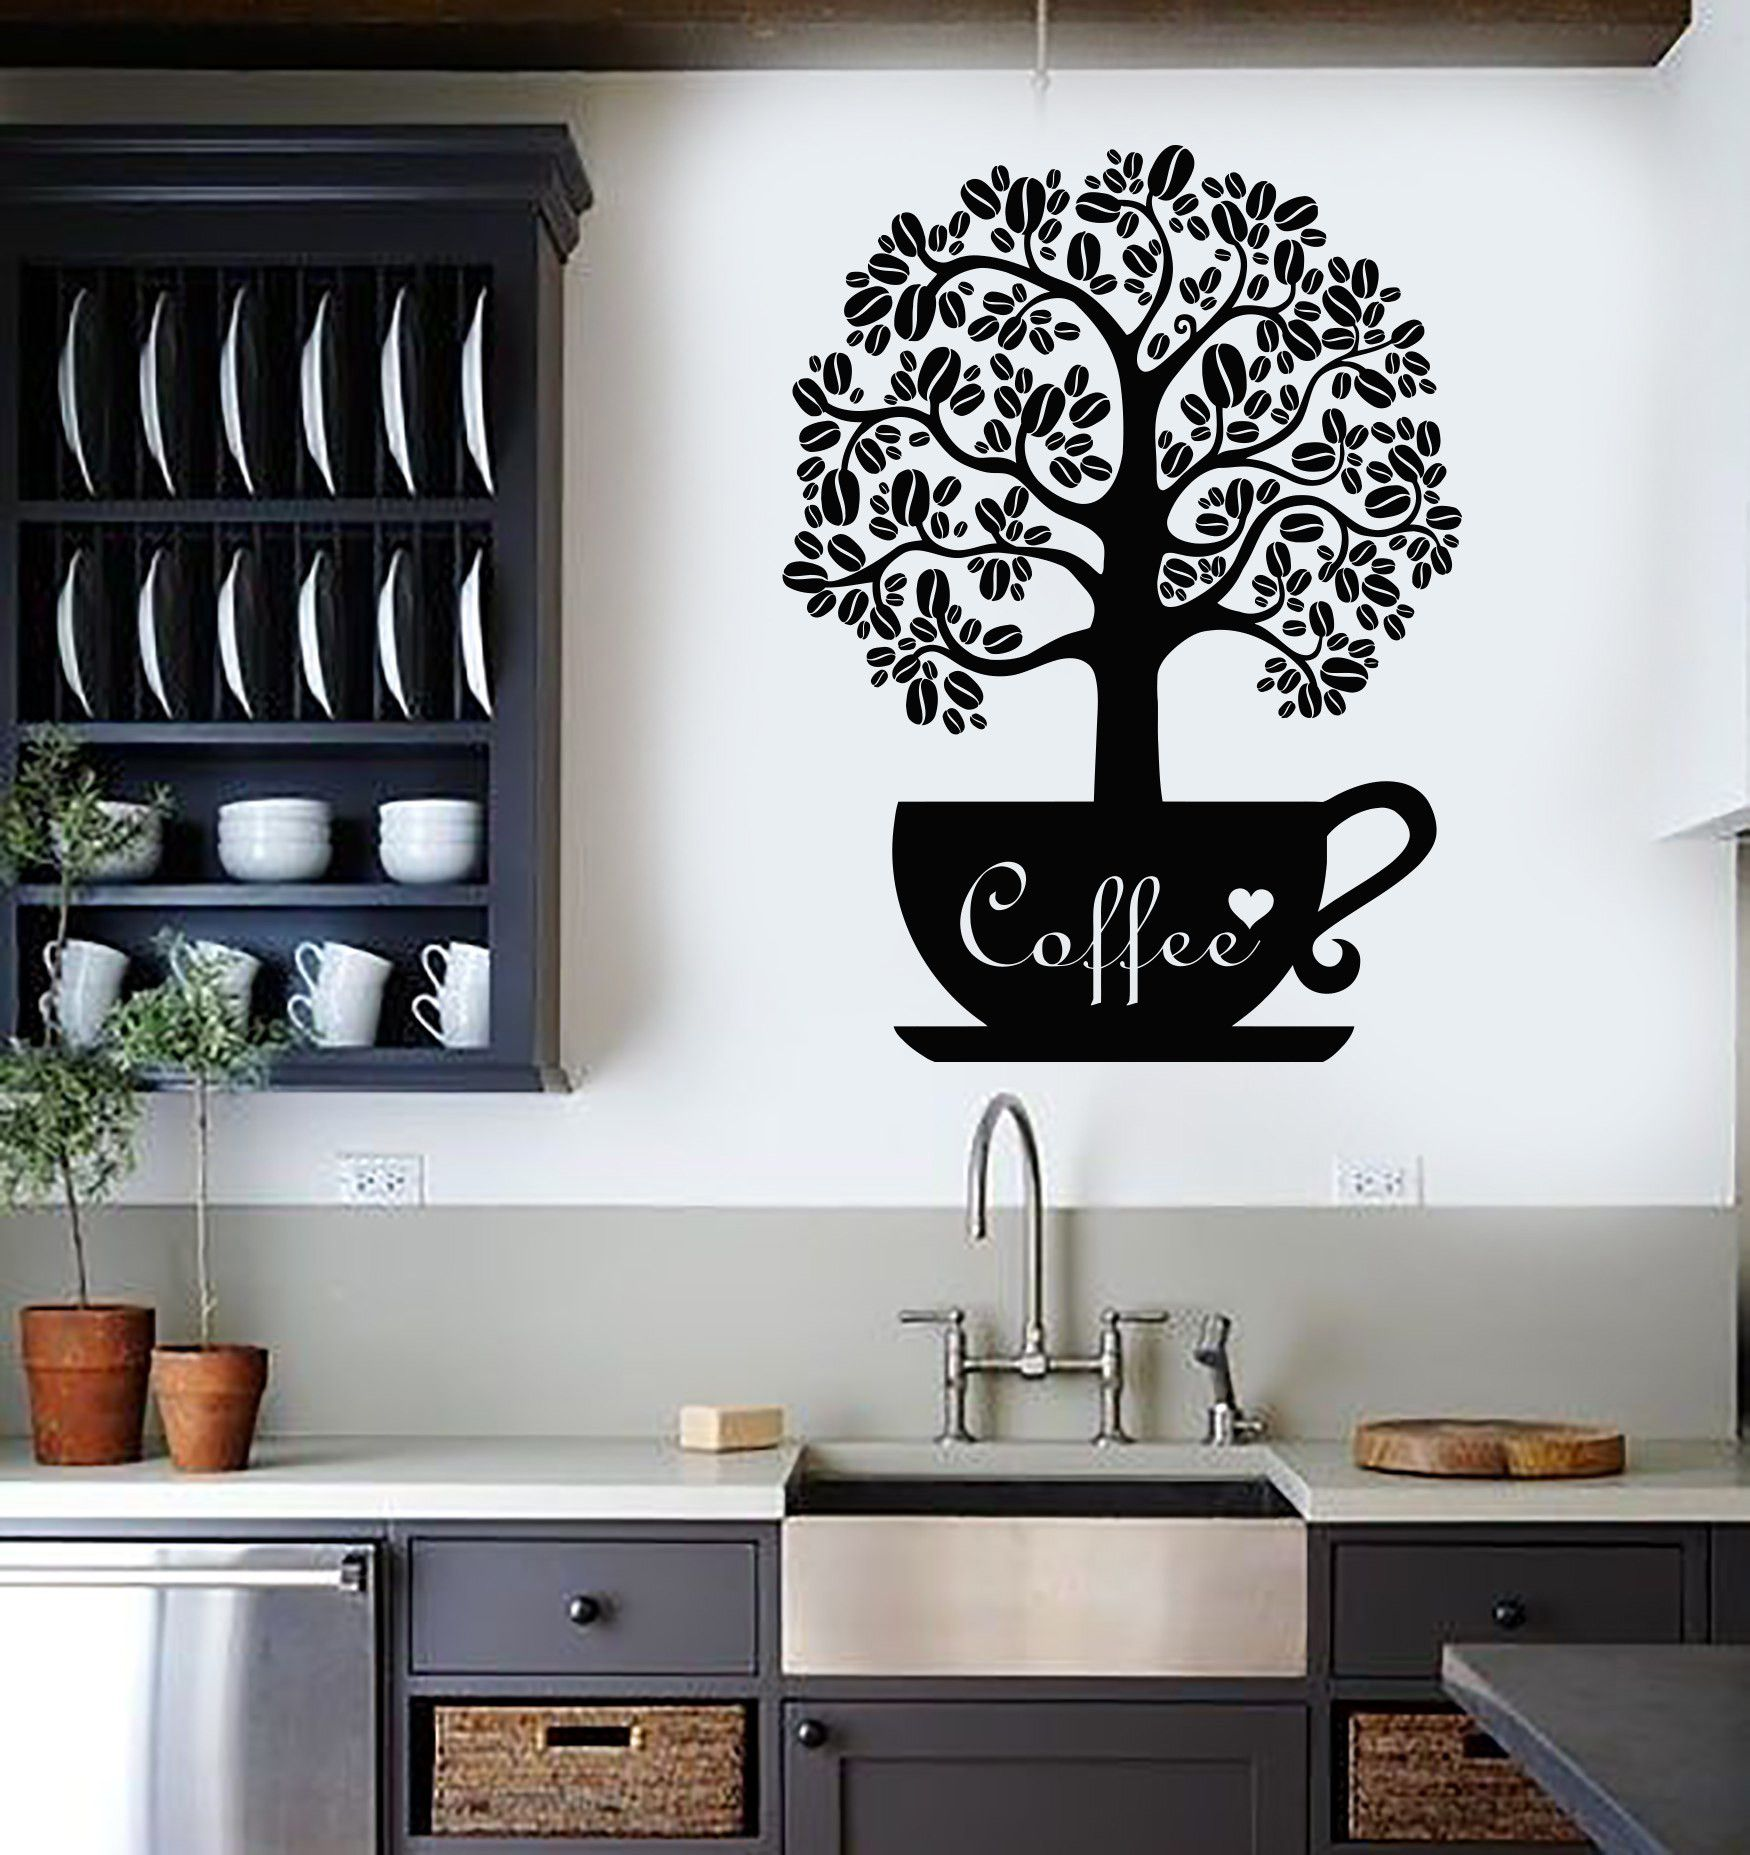 картинки для декорации кухни